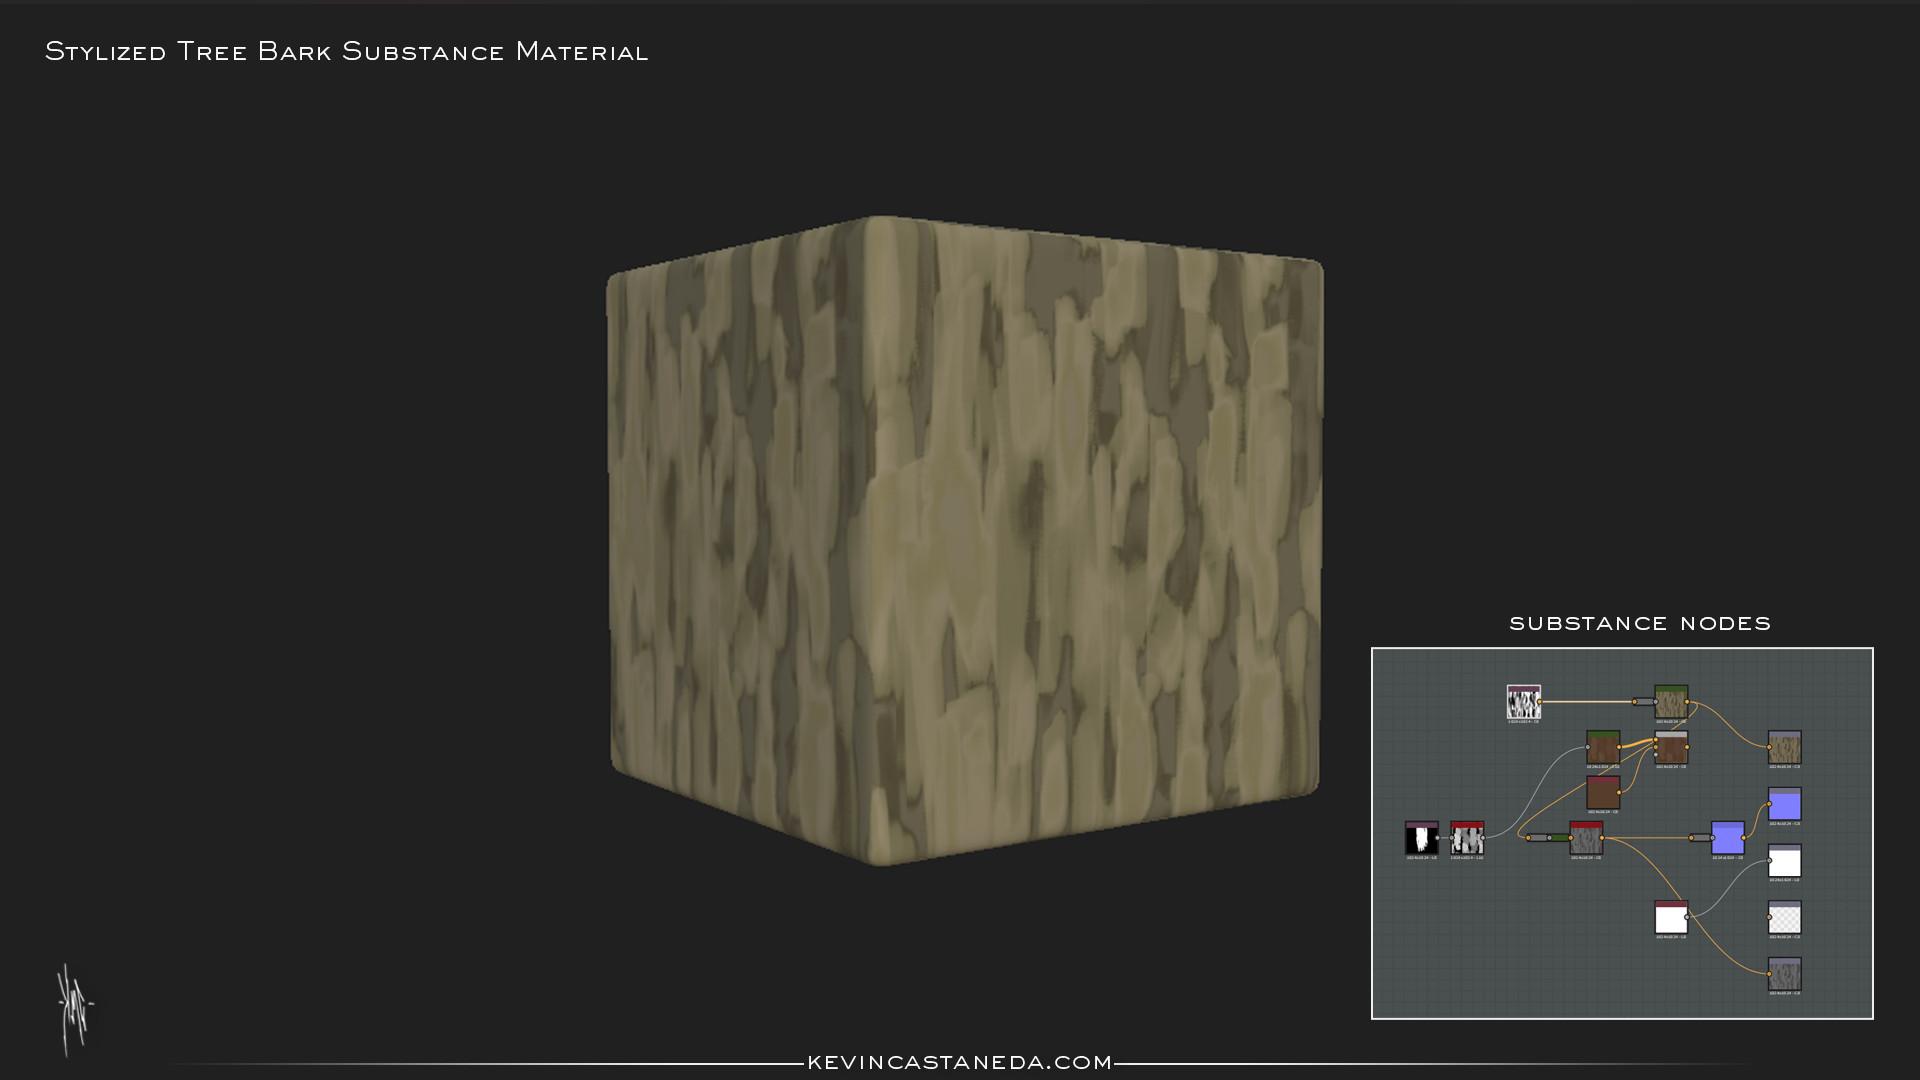 Kevin m castaneda stylized tree bark